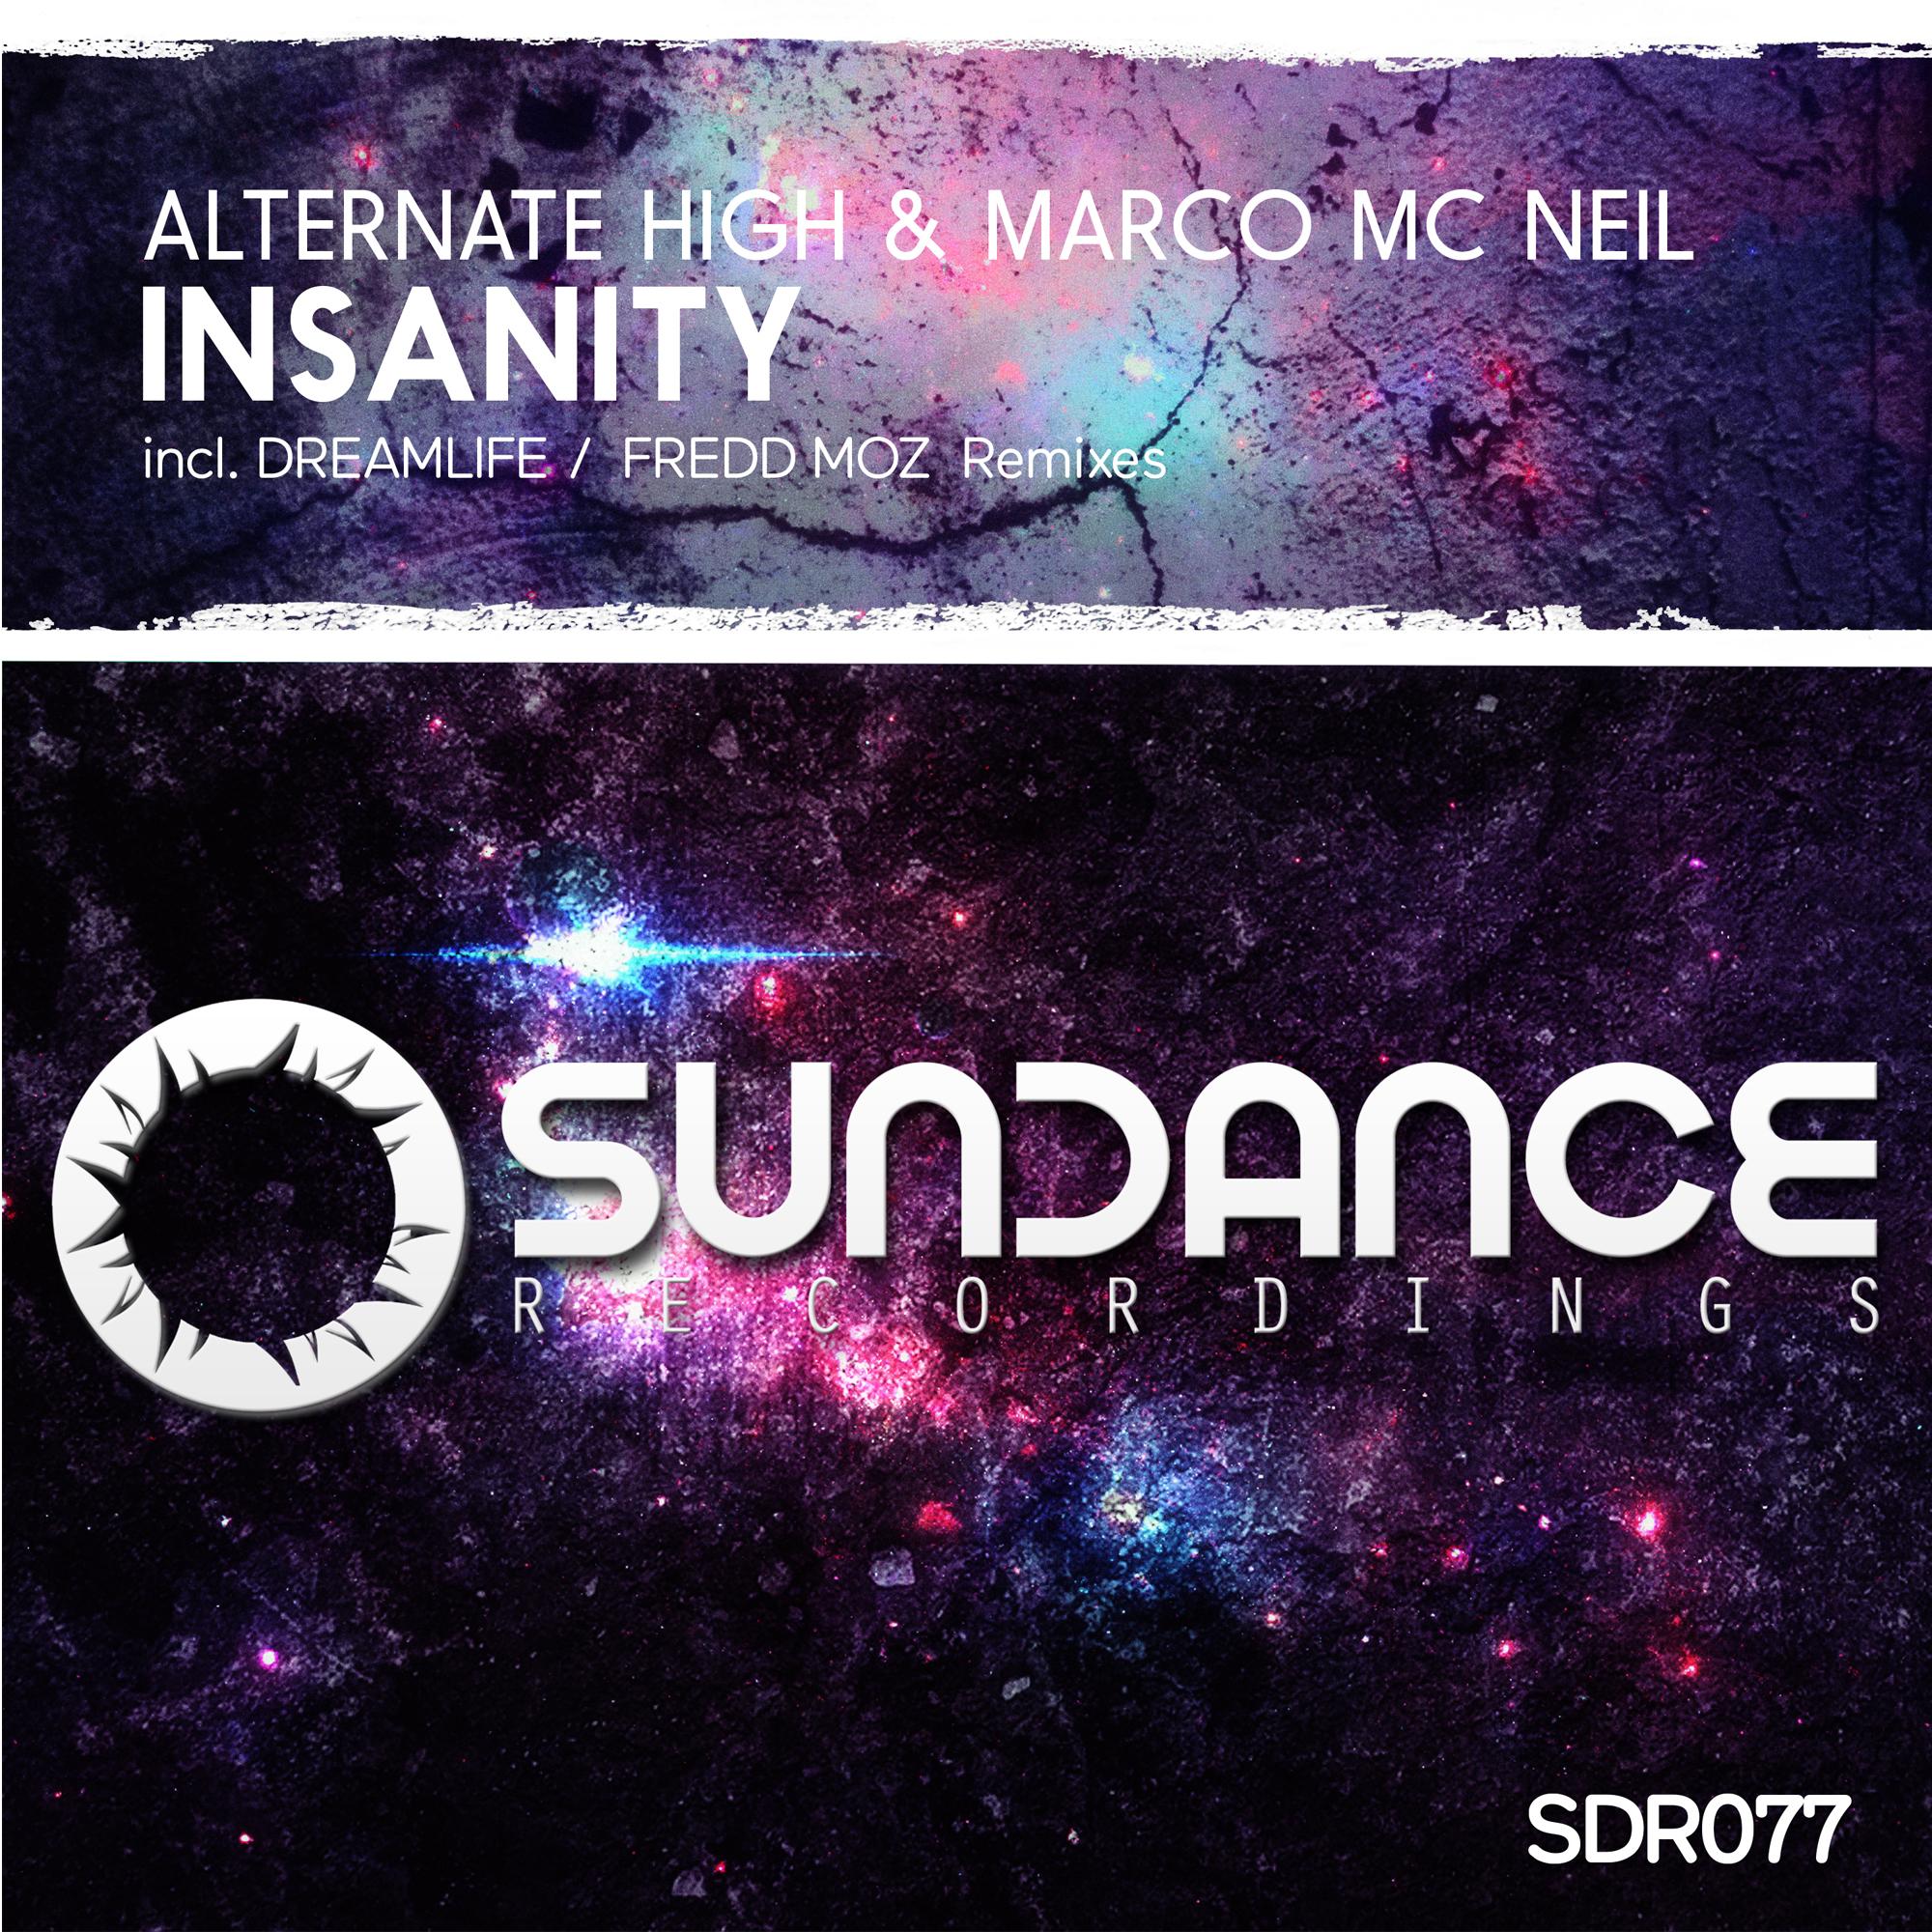 Alternate High & Marco Mc Neil - Insanity (DreamLife Remix)